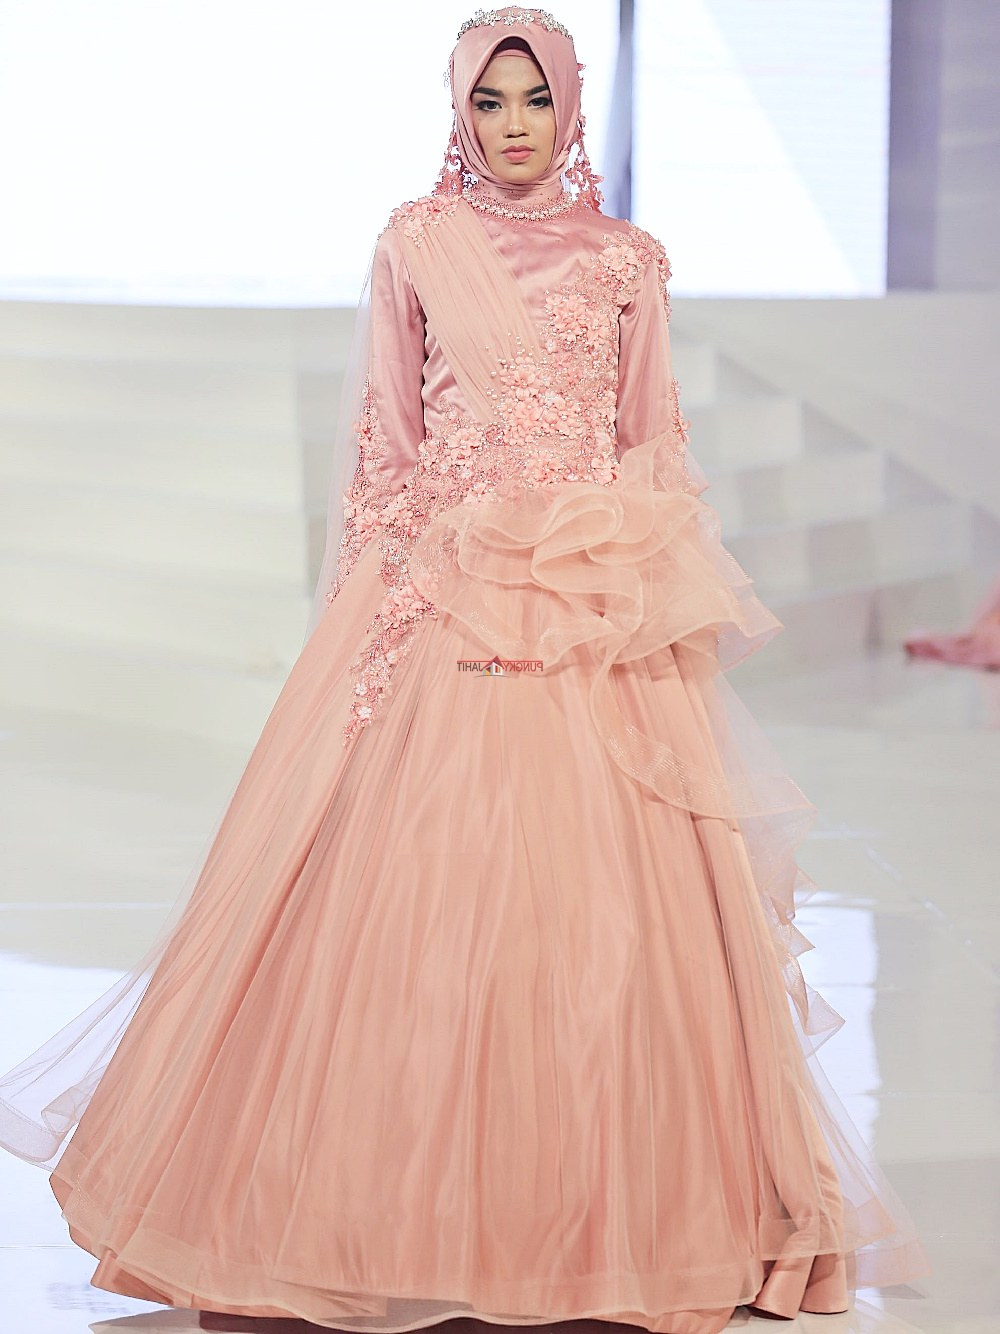 Model Harga Sewa Baju Pengantin Muslimah Q5df Sewa Perdana Baju Pengantin Muslimah Jogja Gaun Pengantin